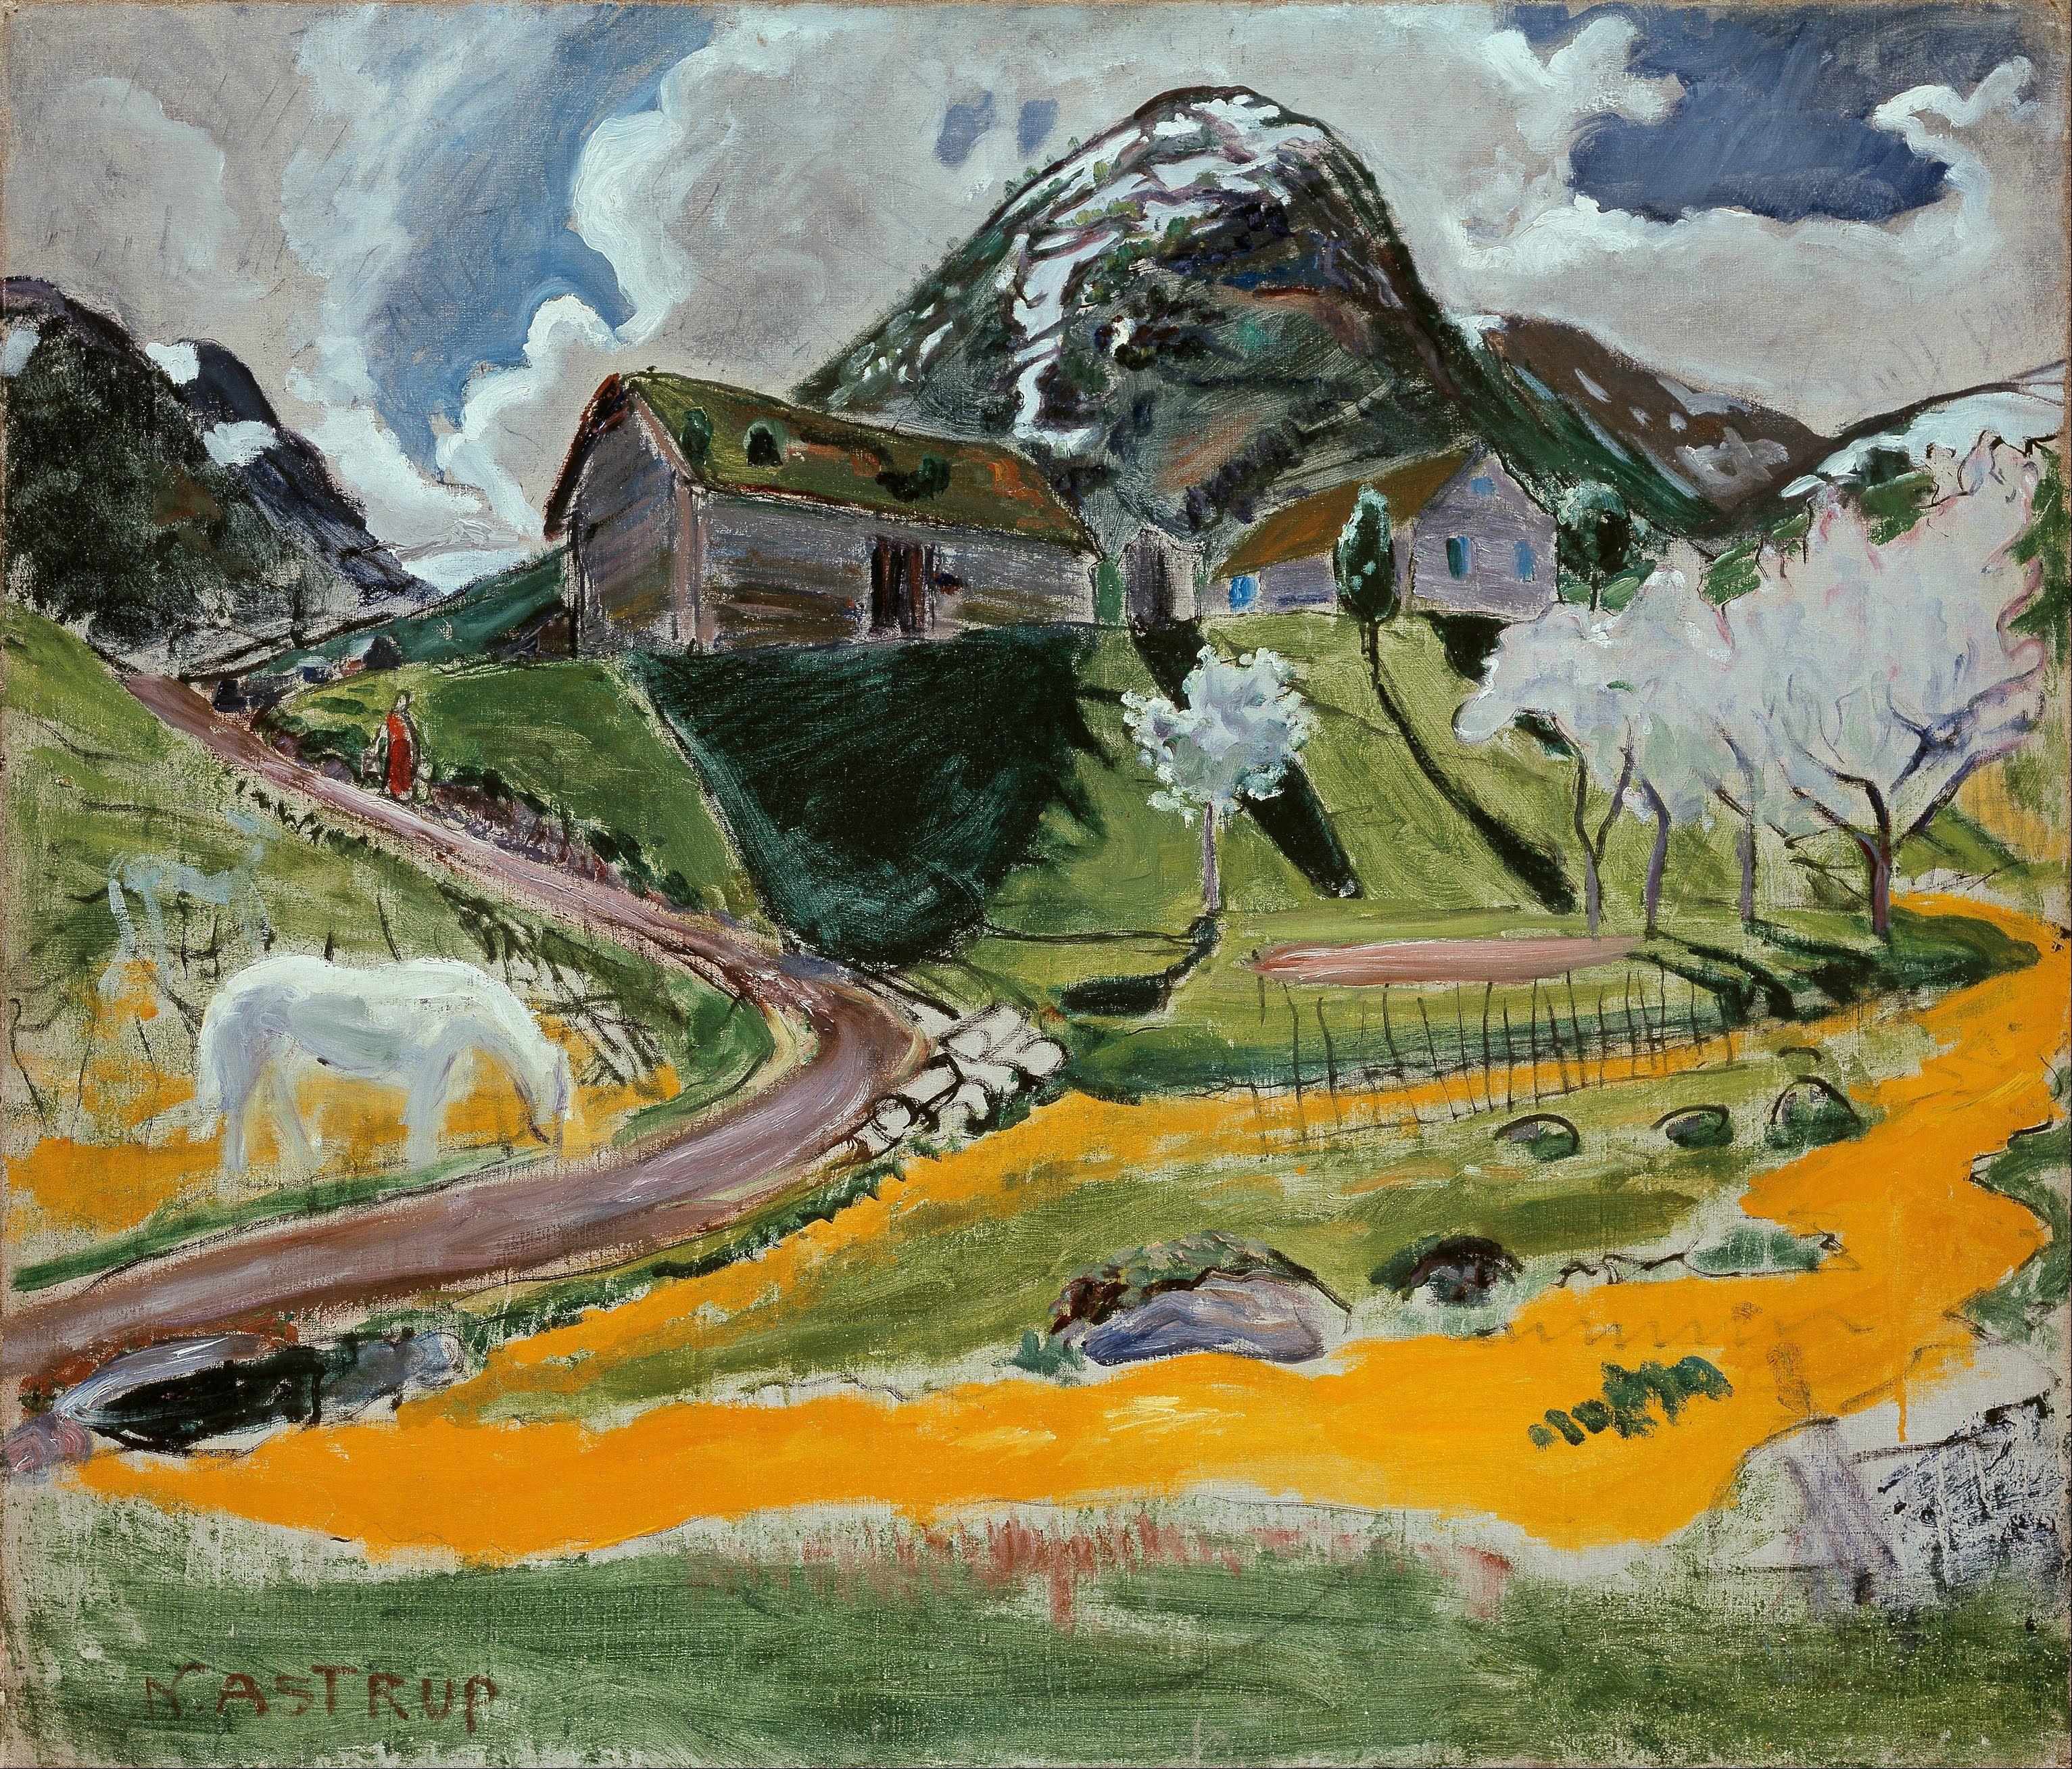 Nikolai_Astrup_-_The_white_Horse_in_Spring_-_Google_Art_Project.jpg (3065×2617)